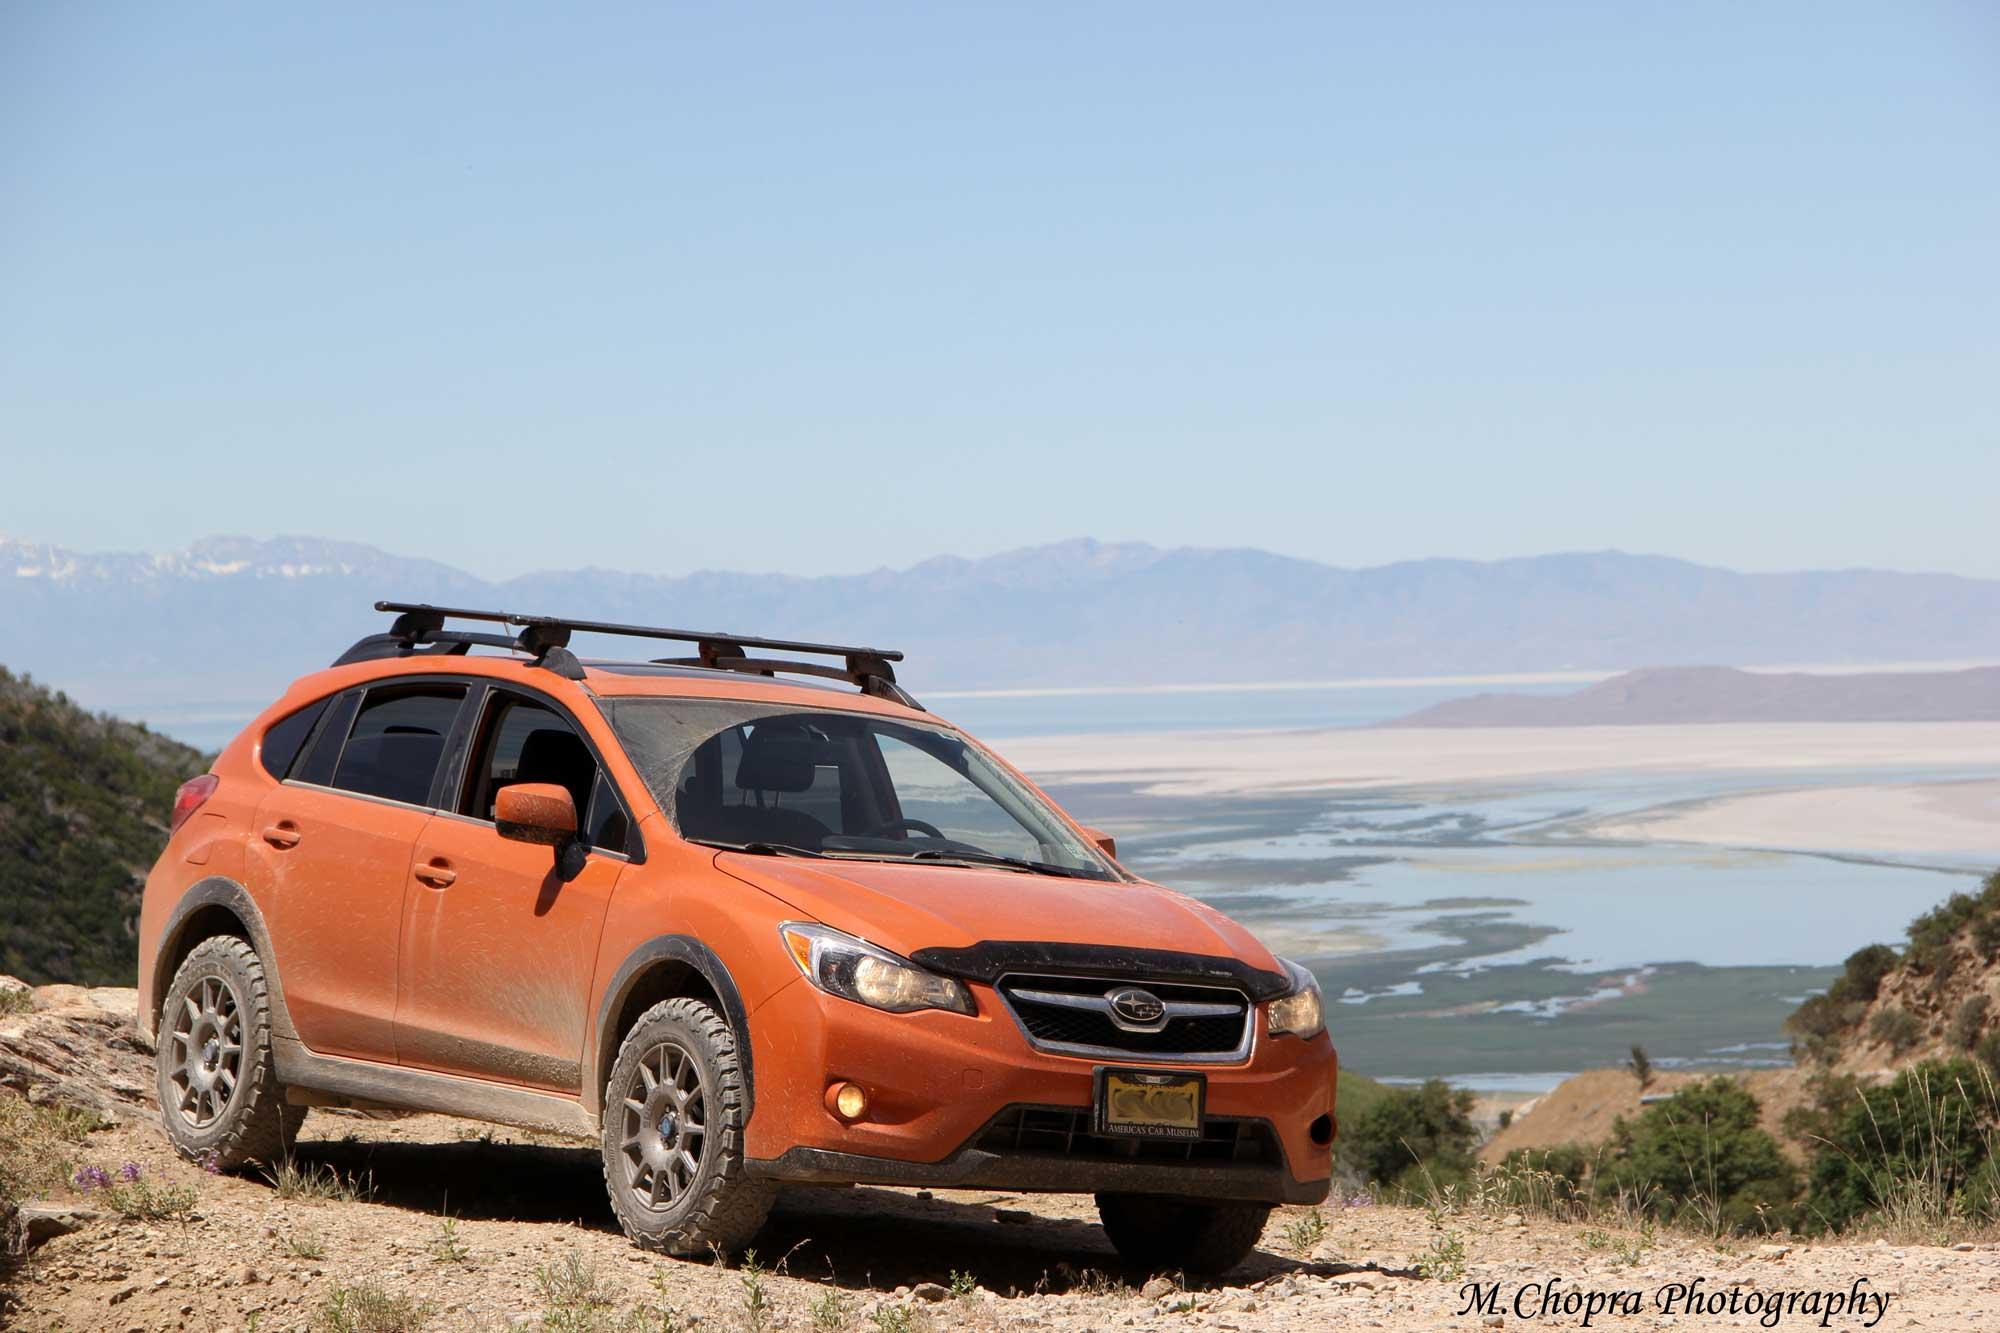 Marlon's 2014 Tangerine Subaru XV Crosstrek